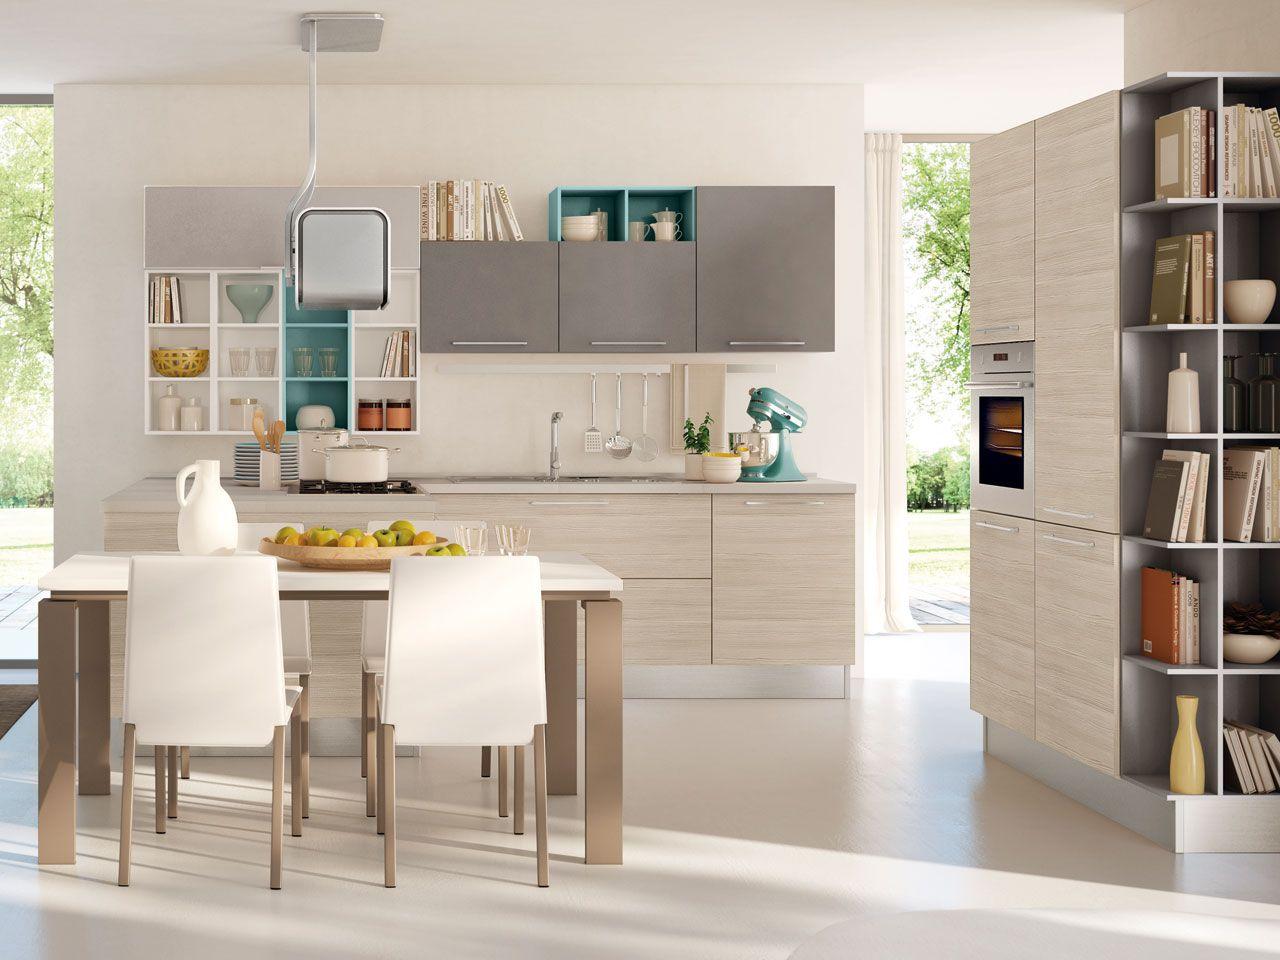 Swing - Cucine Lube - LA NOSTRA!! | Home | Pinterest | Cucine ...